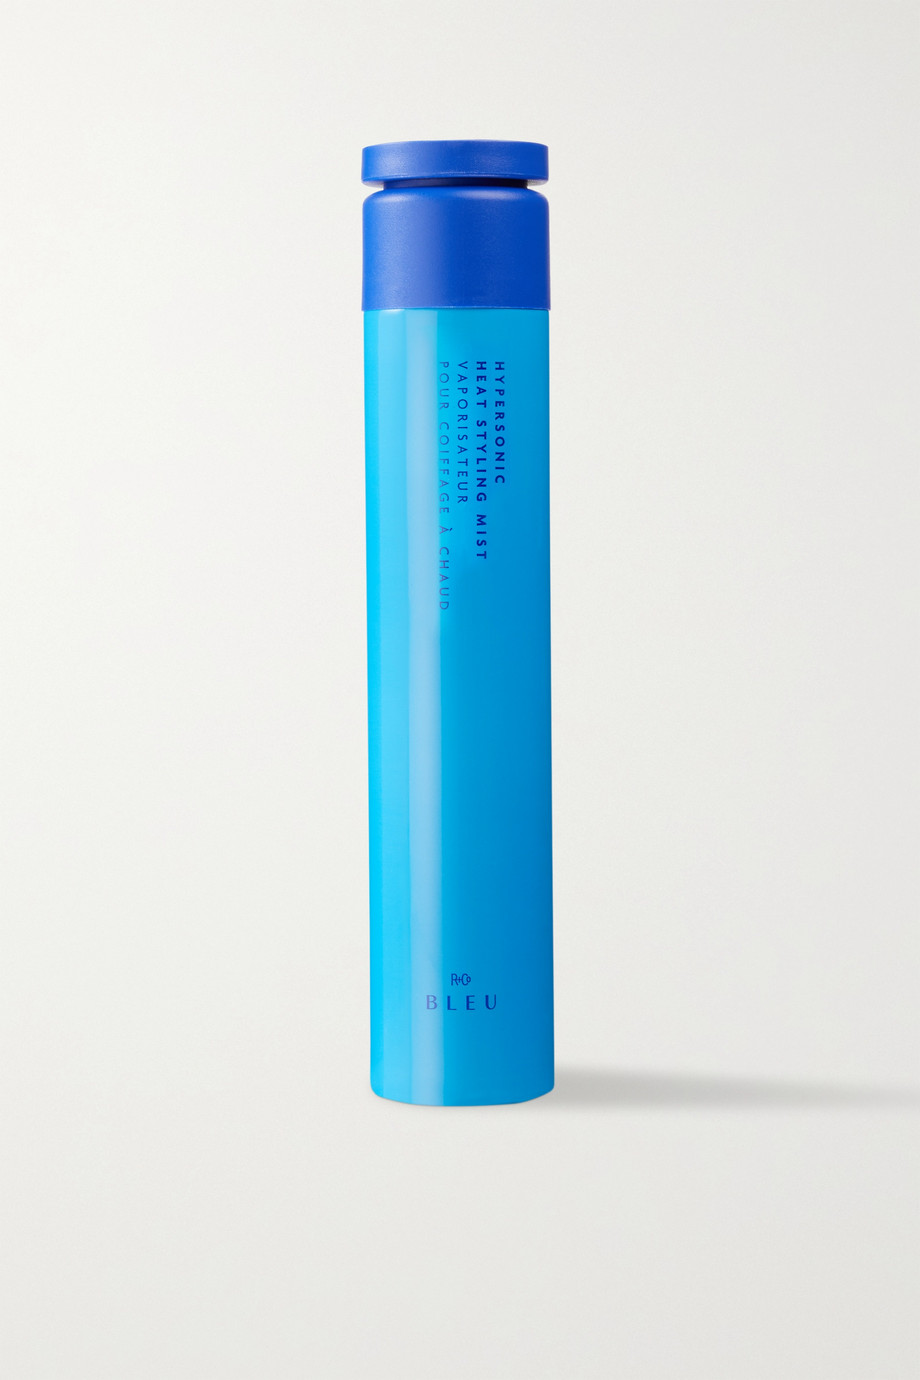 R+Co BLEU Hypersonic Heat Styling Mist, 191ml